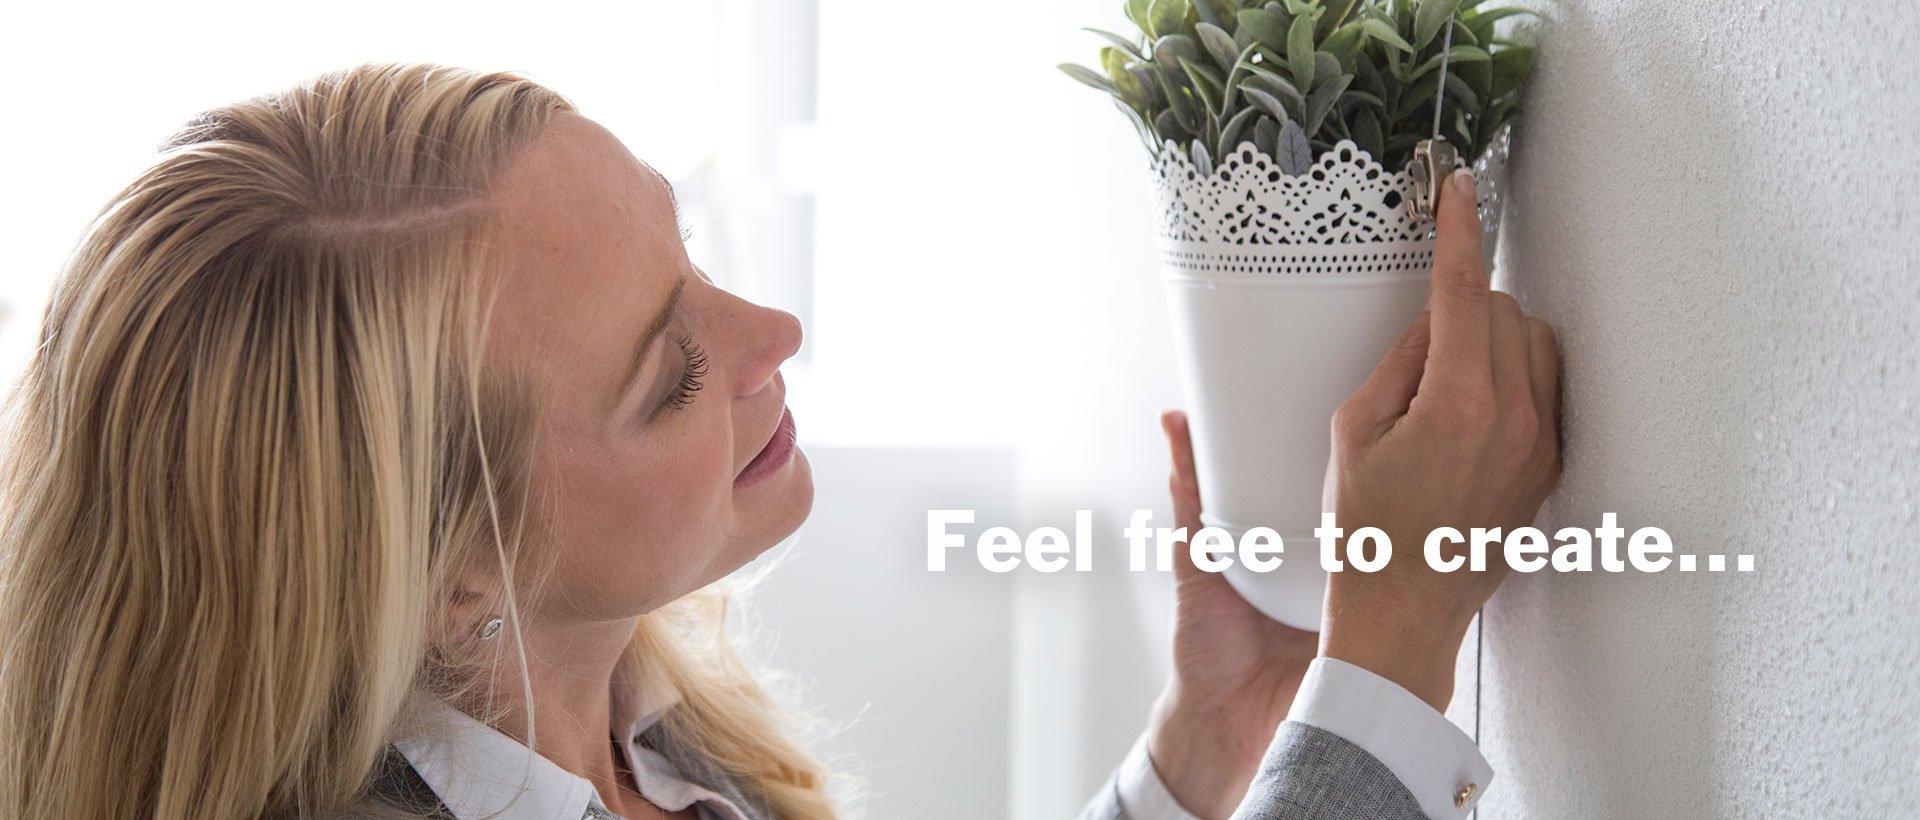 Zavěste rostlinu